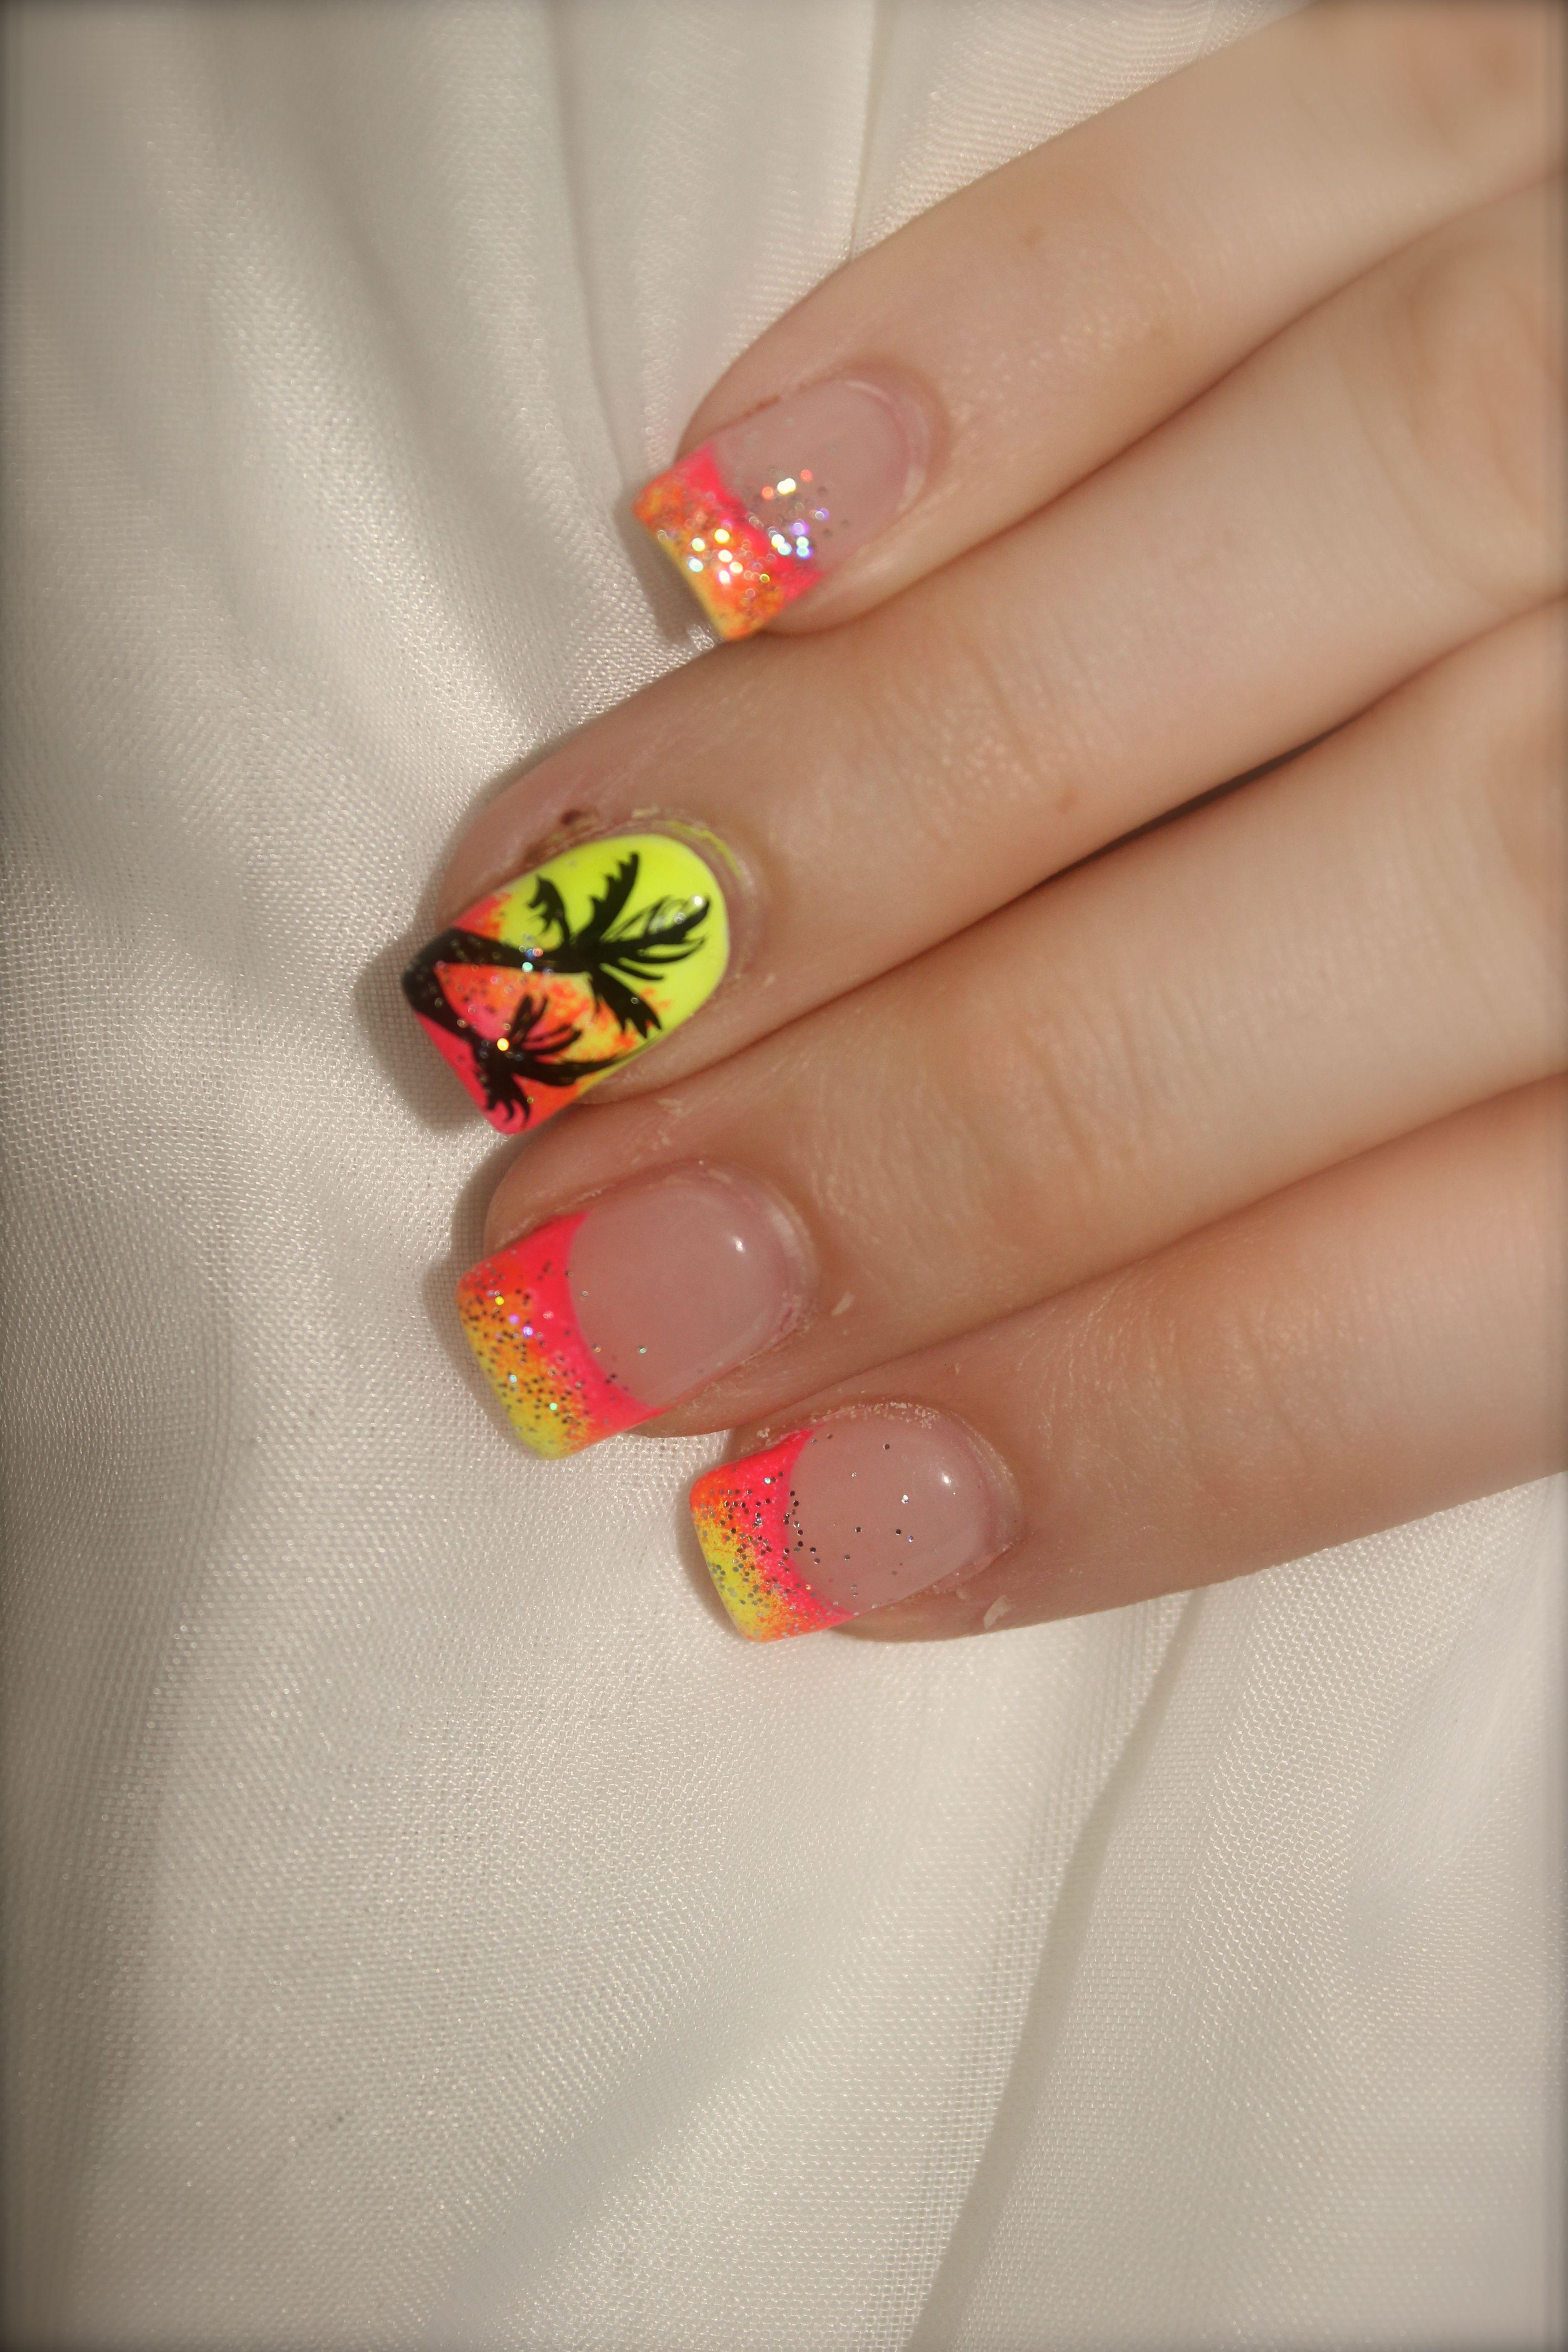 Nail Designs For Caribbean Vacation : Tropical vacation nails nail designs